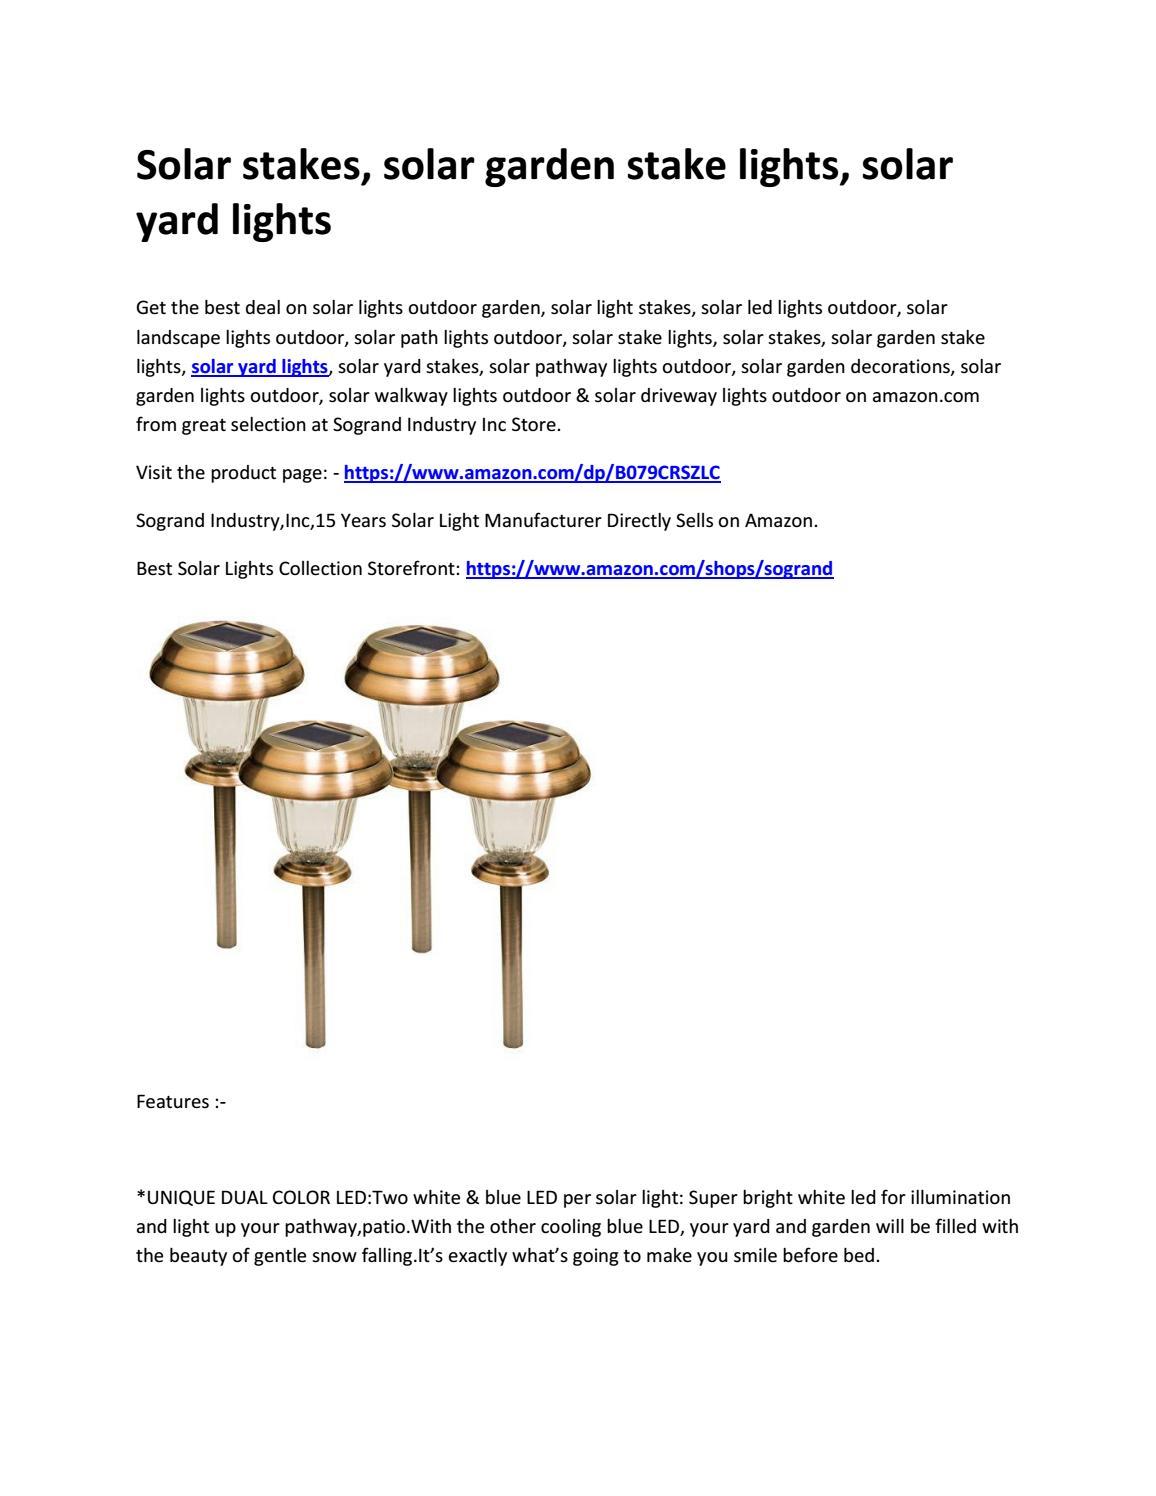 Solar Stakes Solar Garden Stake Lights Solar Yard Lights By Abhishek Soni Issuu